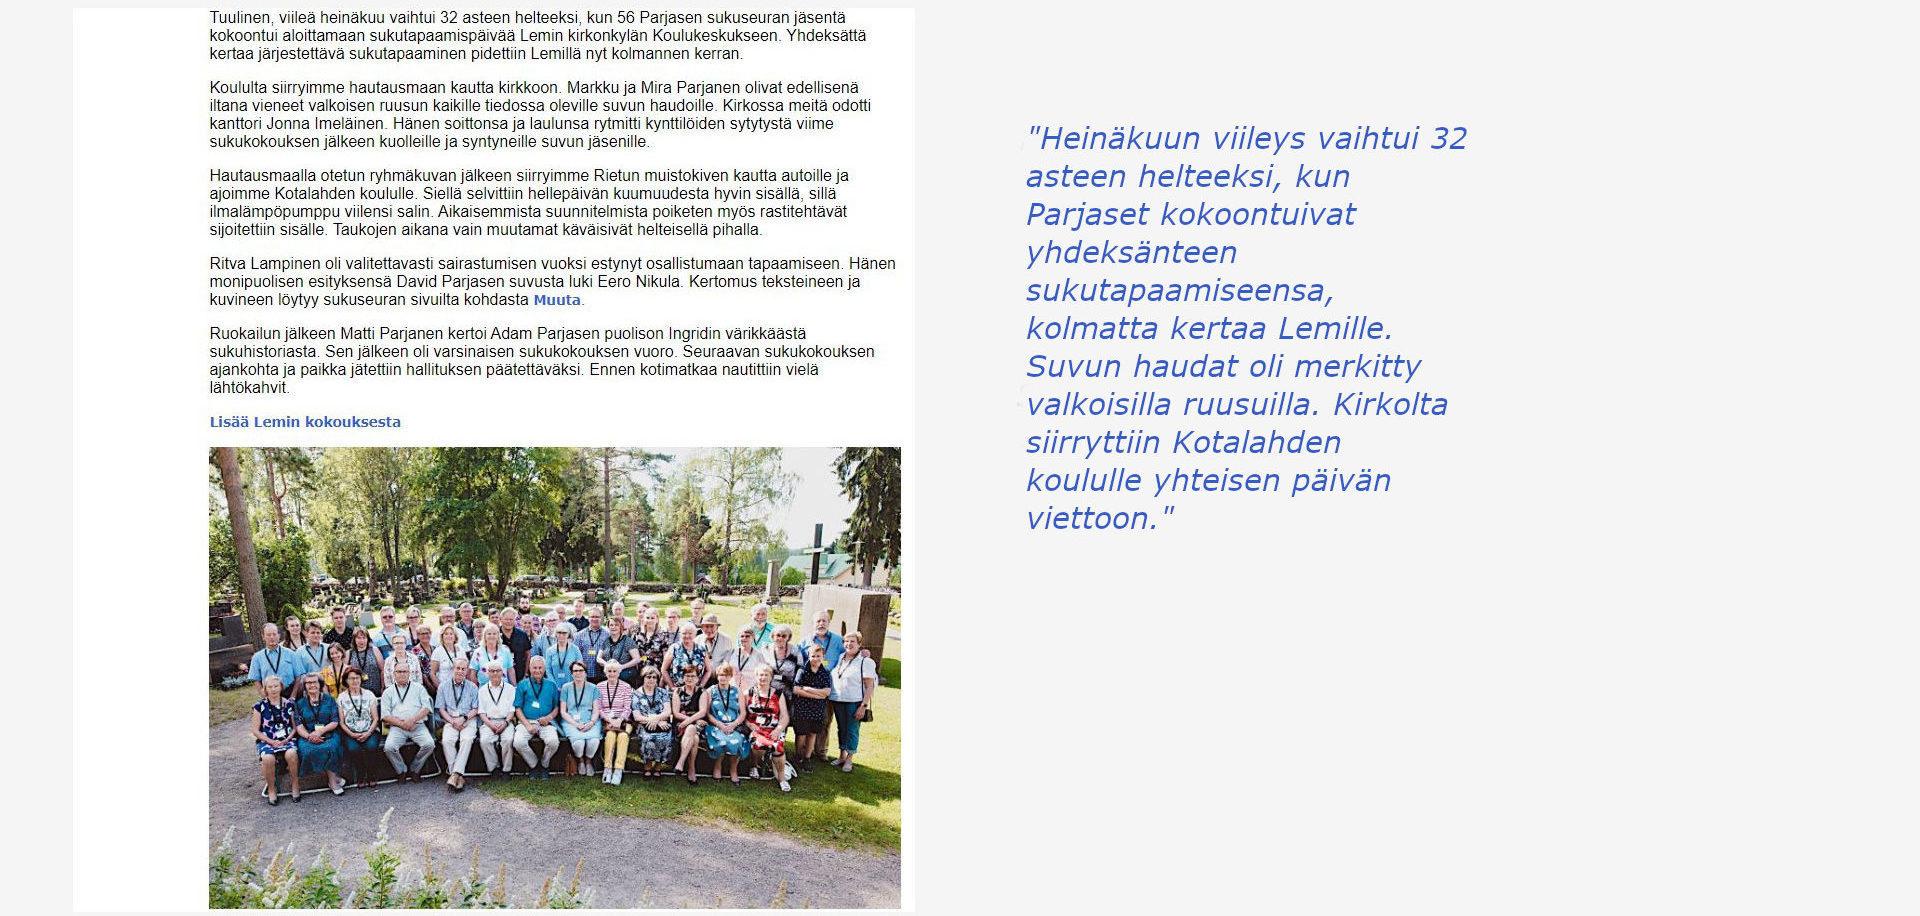 Lähde: http://www.parjasensukuseura.fi/